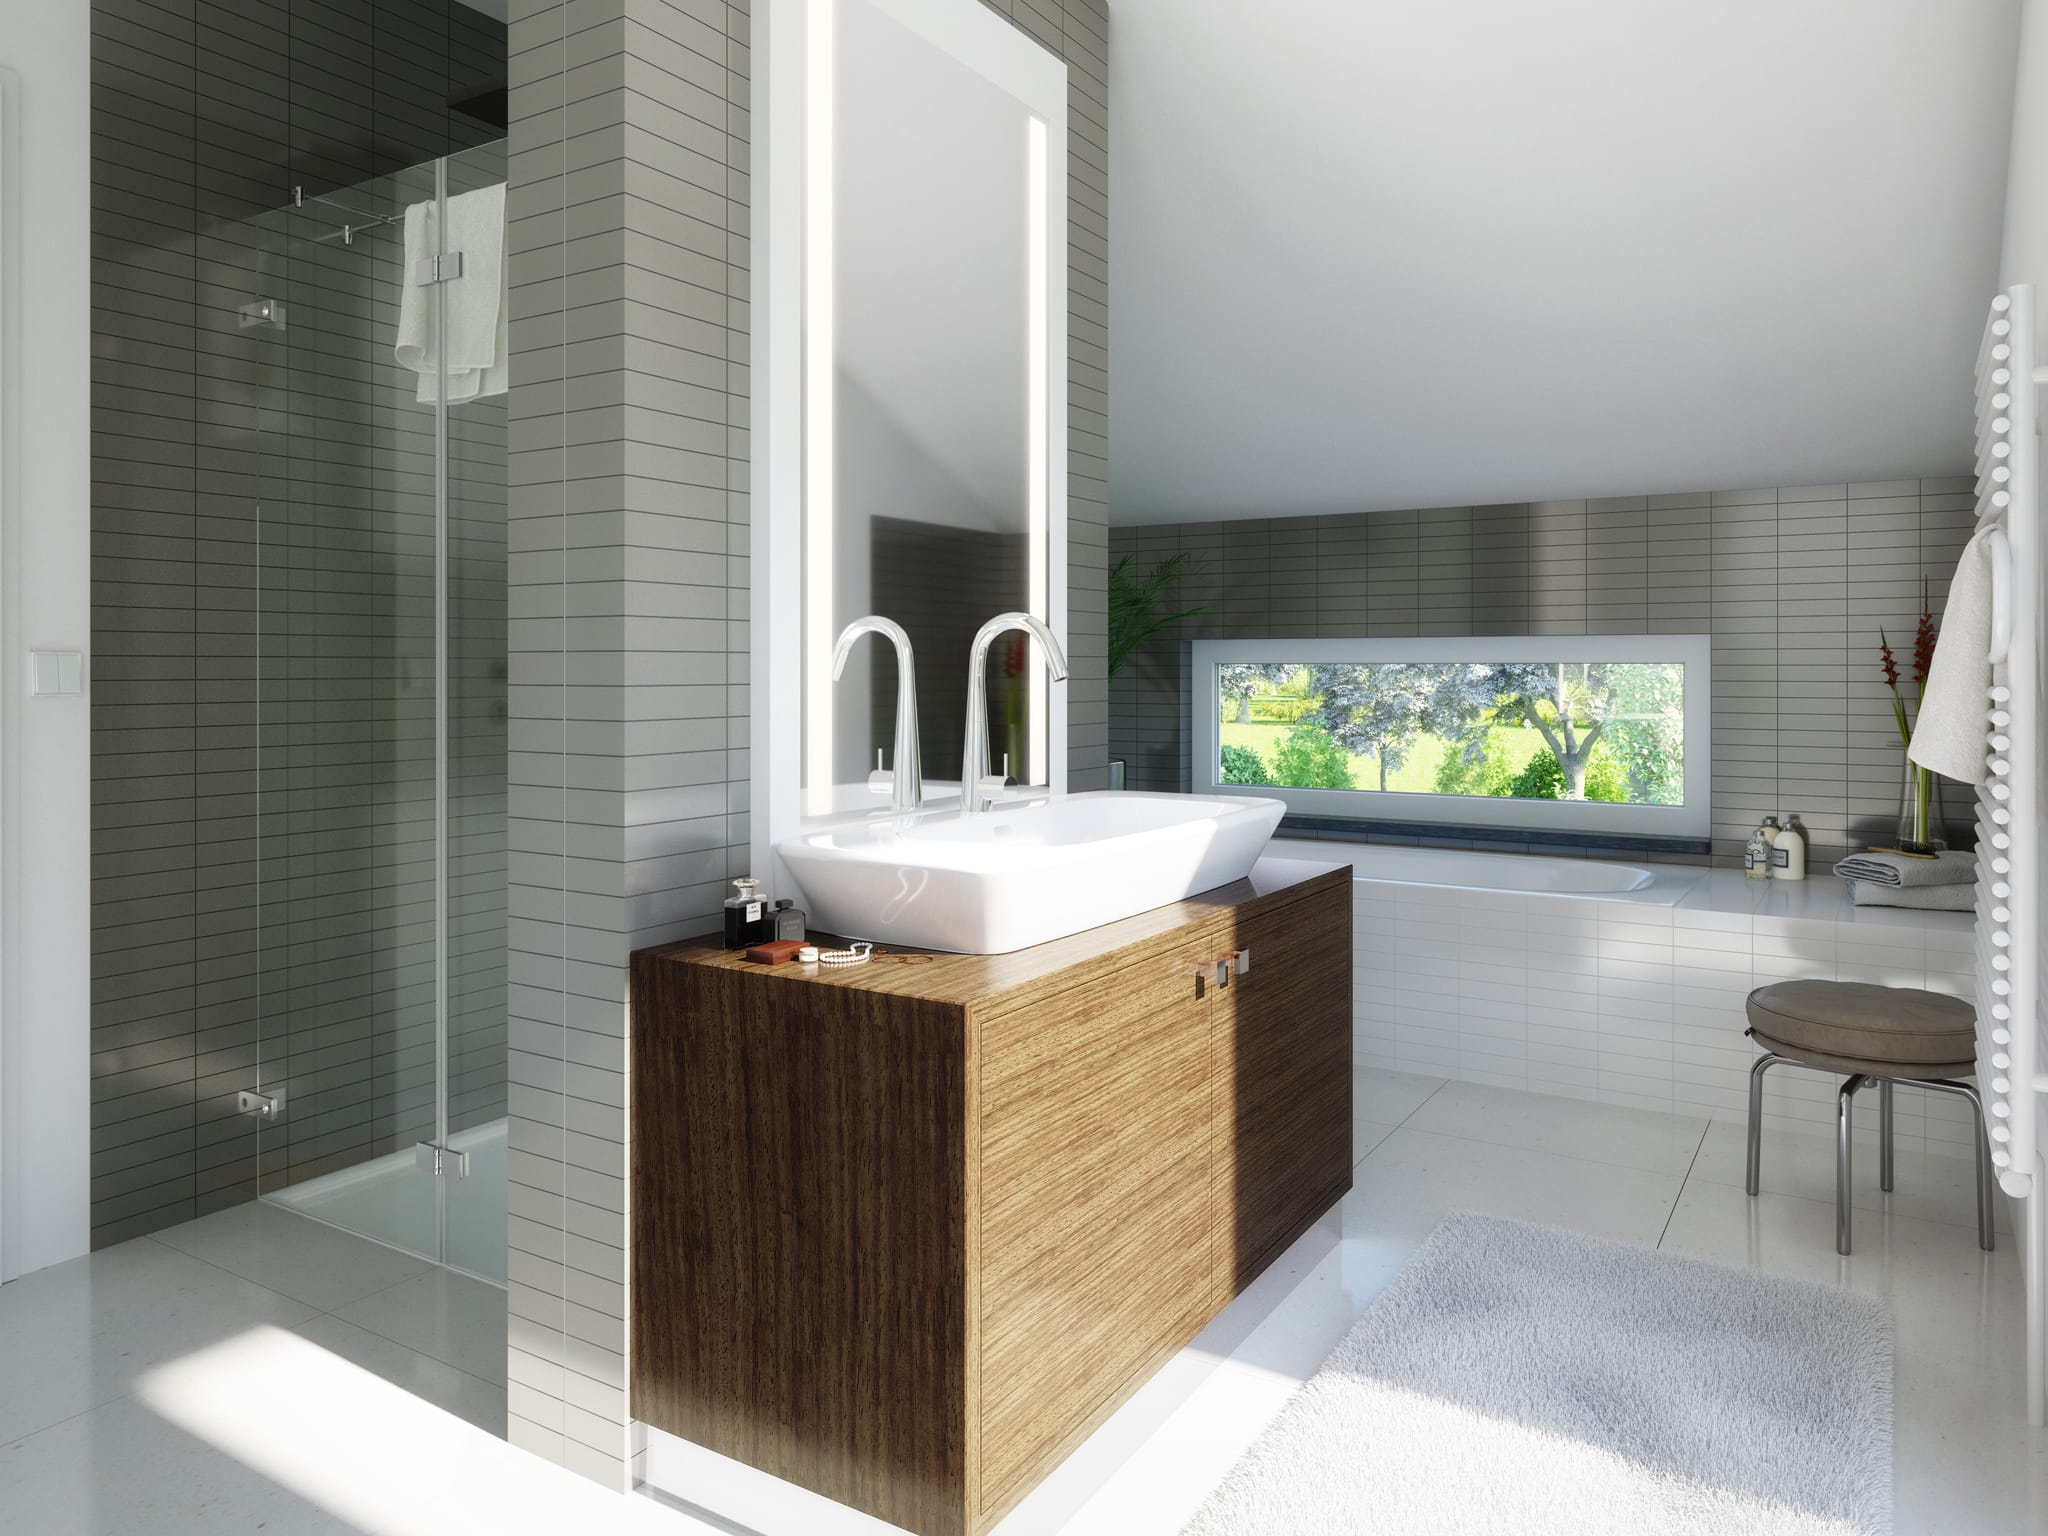 Modernes Badezimmer mit Dusche gemauert als Raumteiler - Ideen Inneneinrichtung Fertighaus SUNSHINE 165 V4 von Living Haus - HausbauDirekt.de